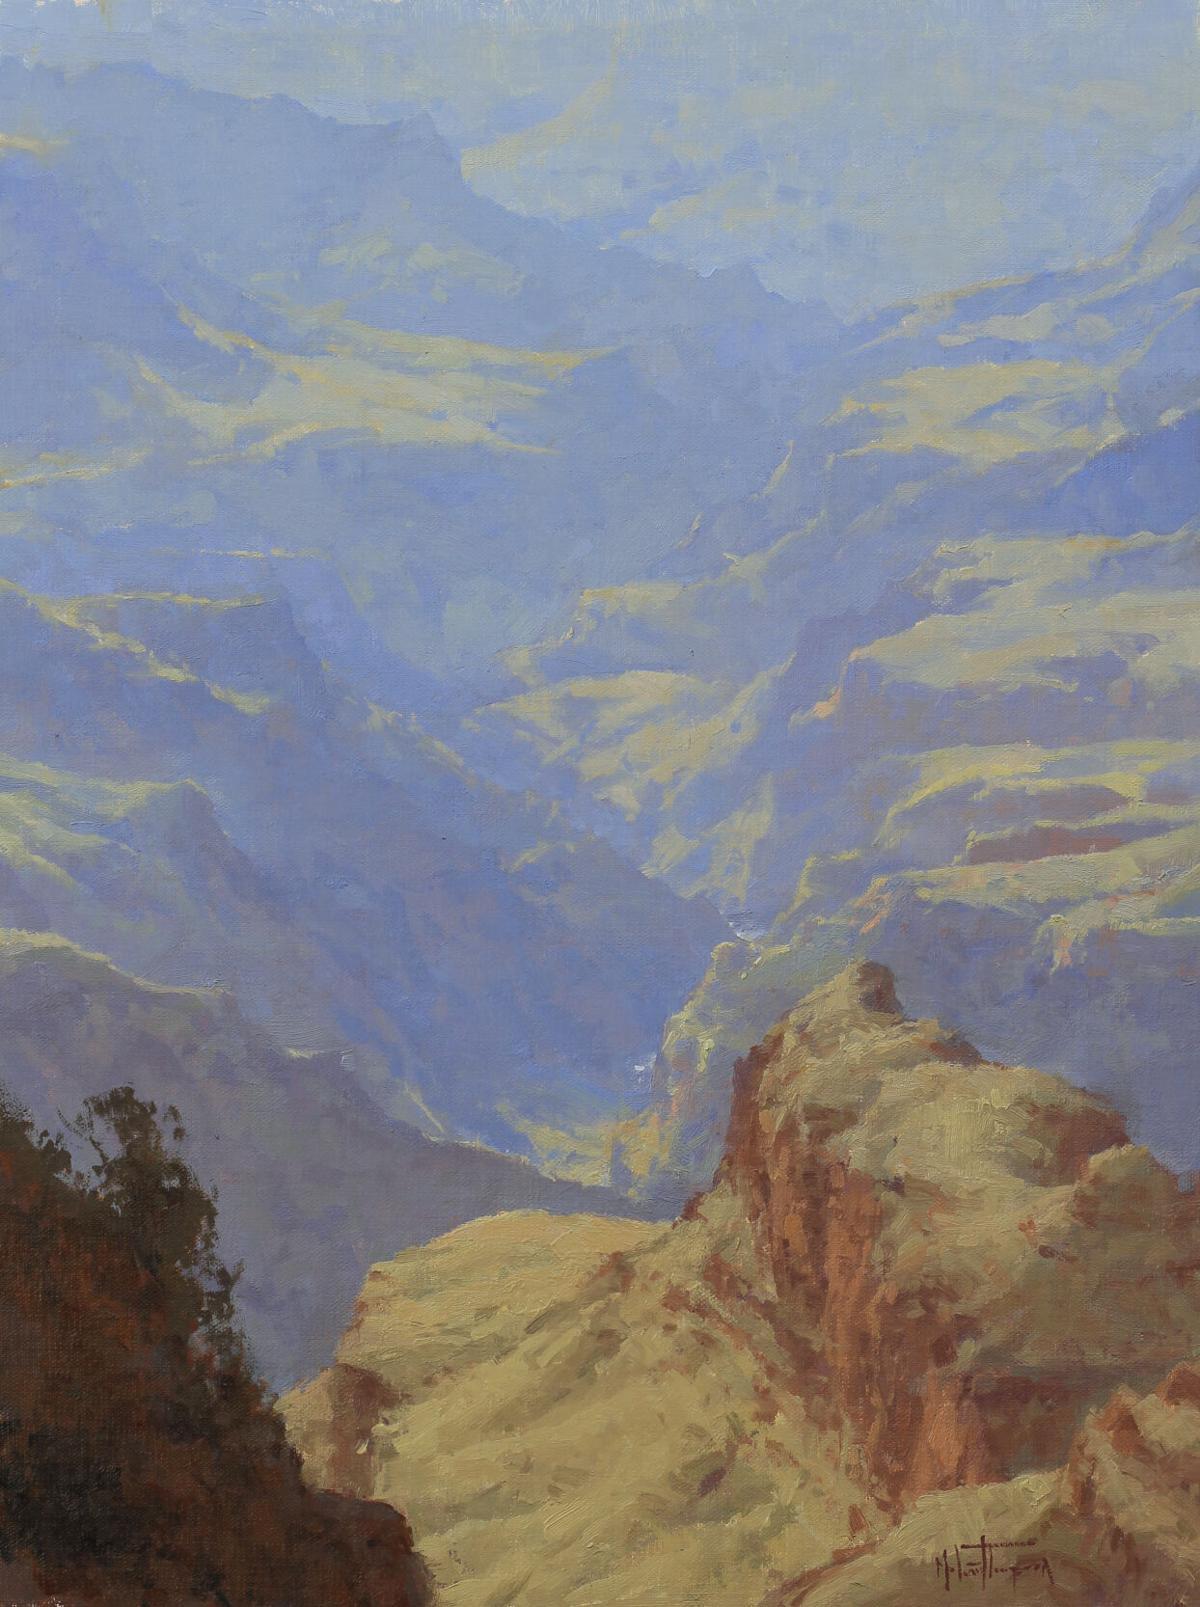 Desert View Layers by Melanie Thompson